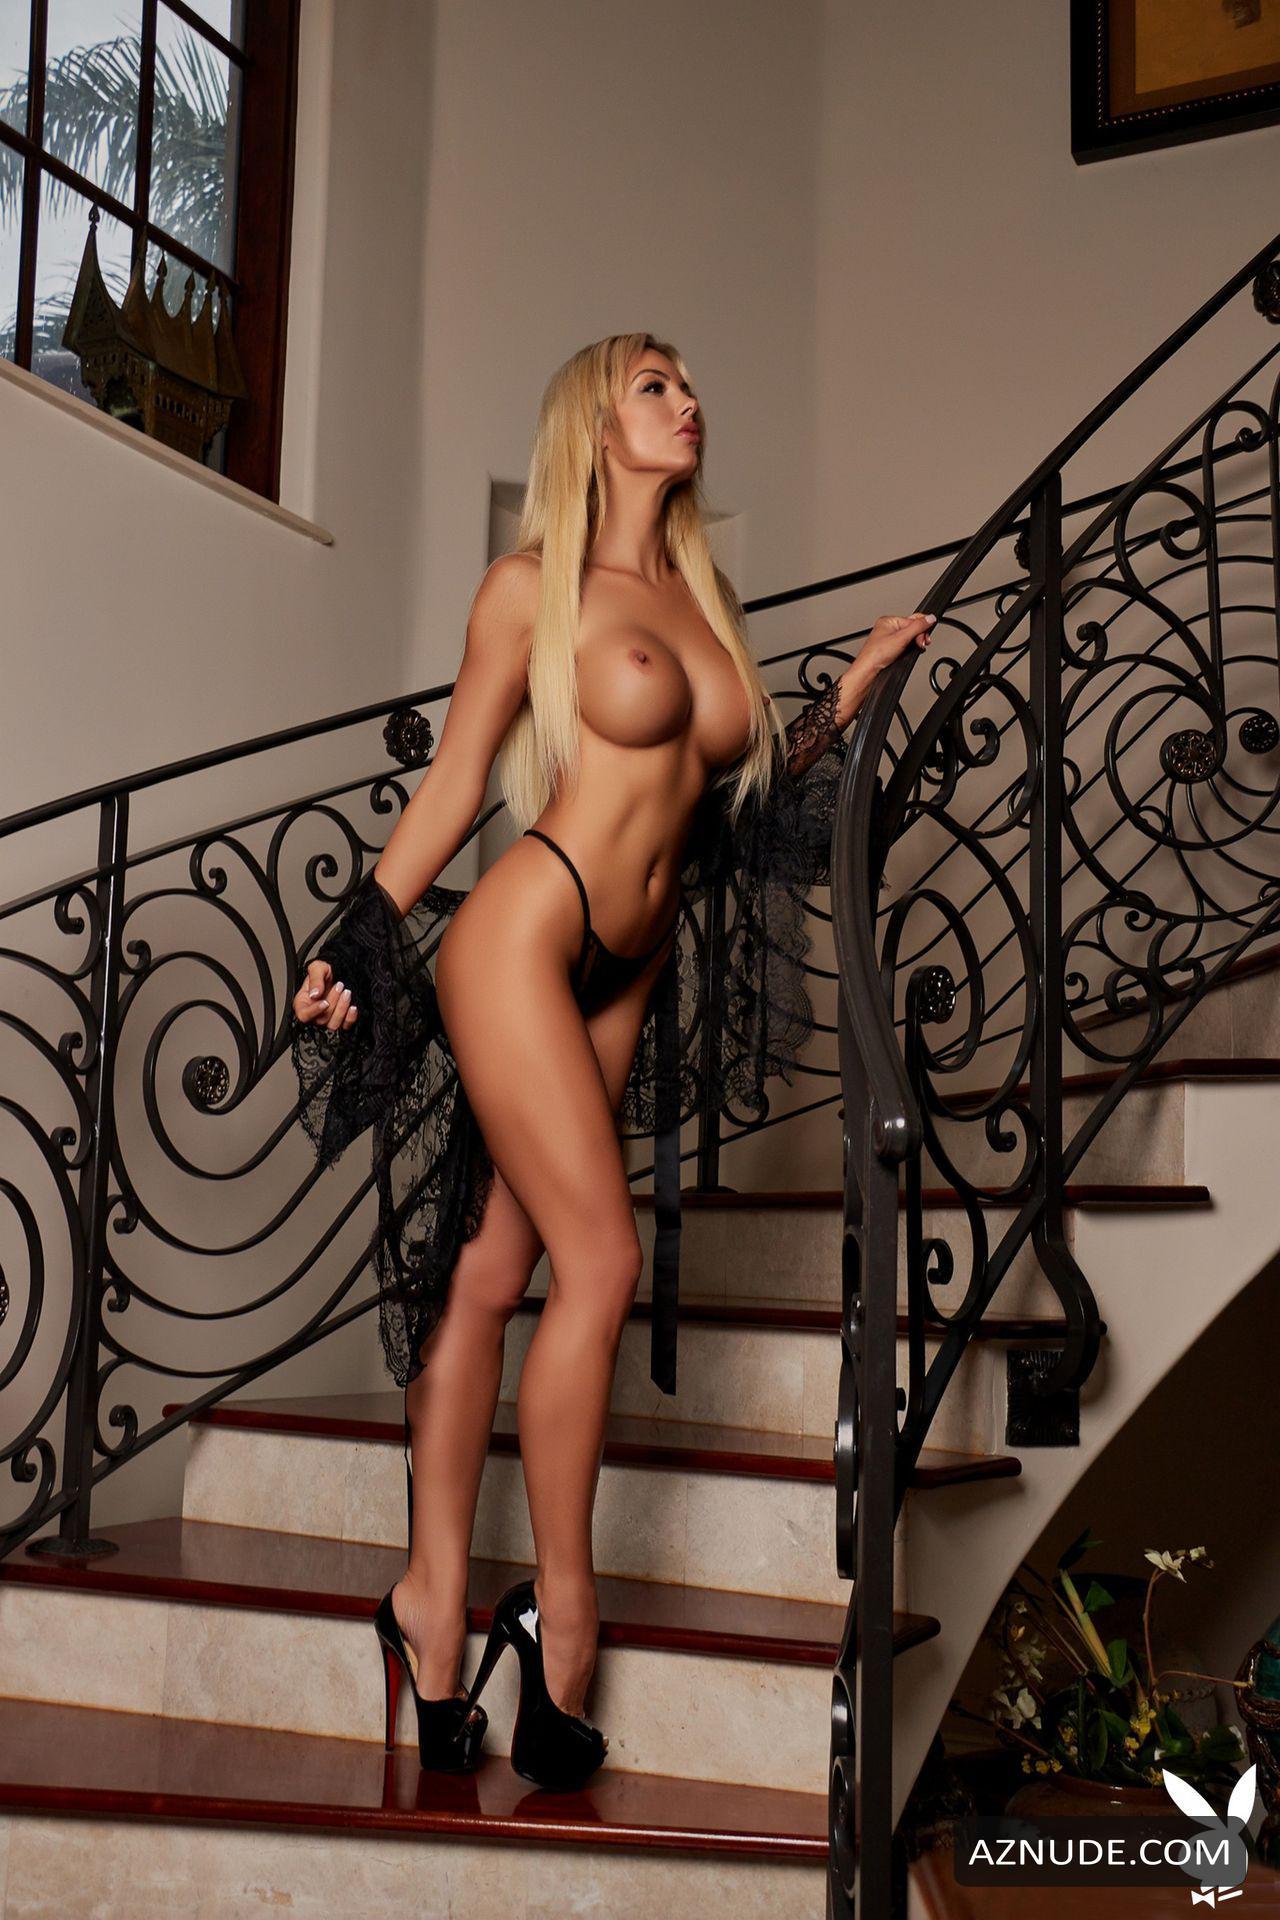 Bethany nackt Giura Exciting naked